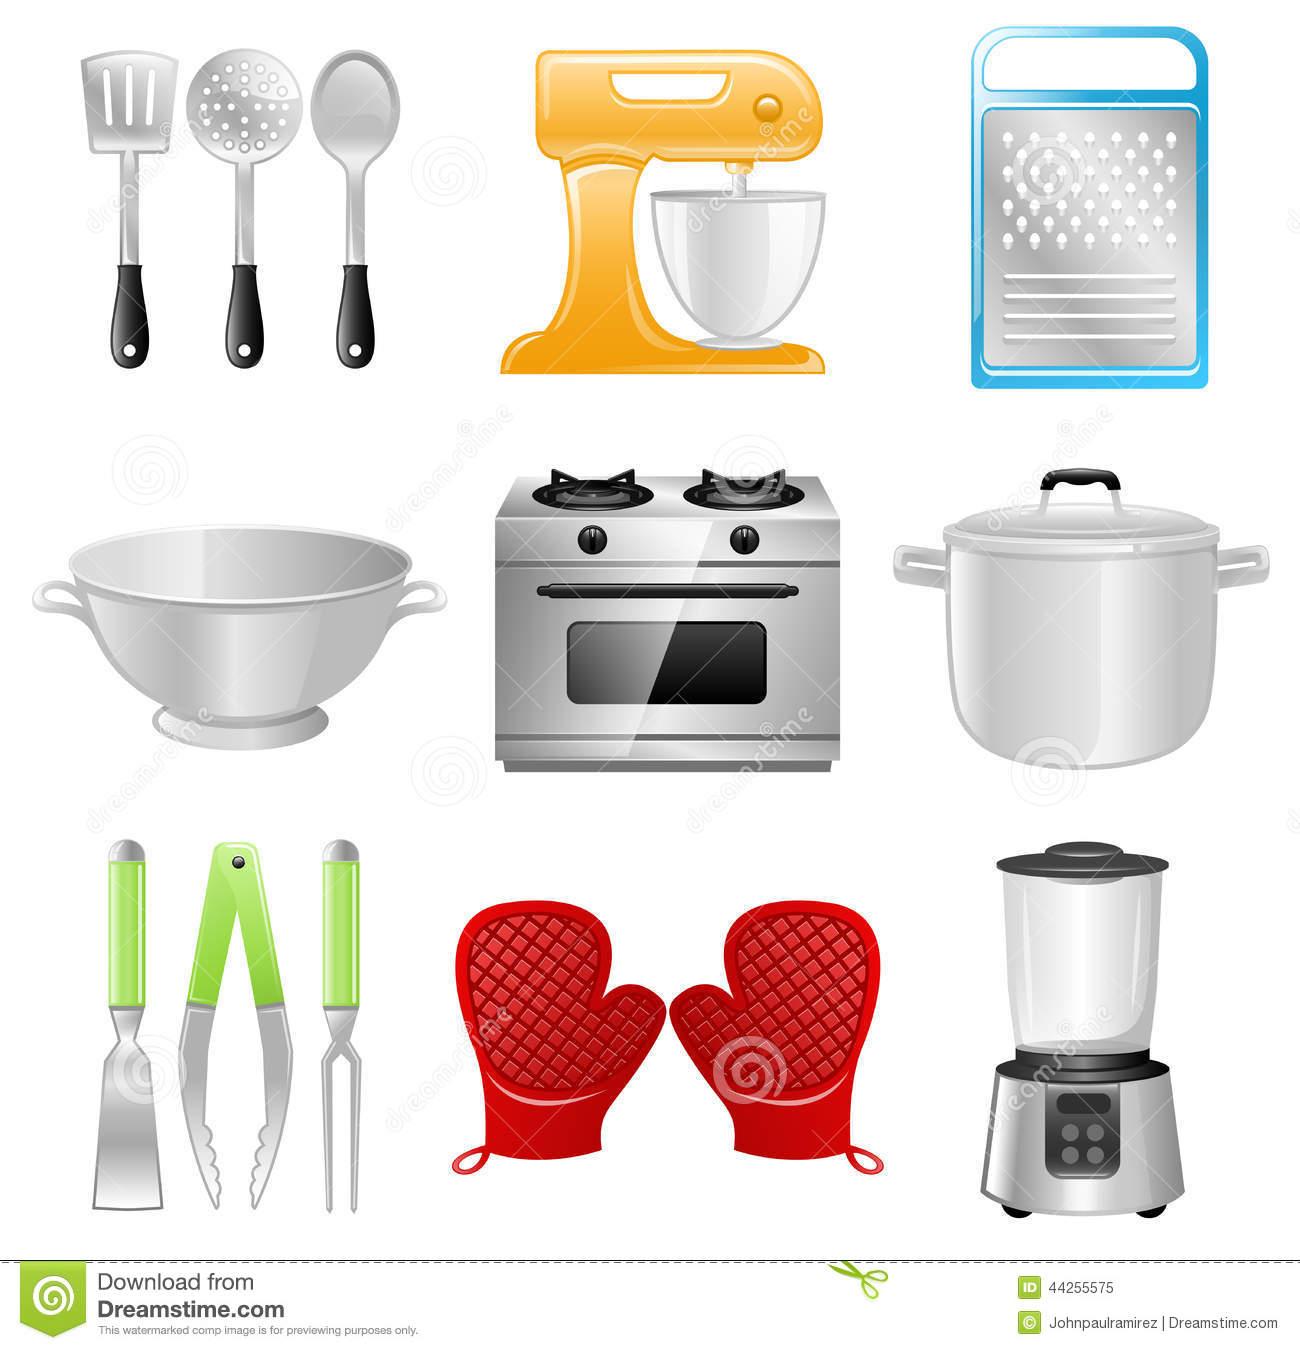 Cookware Amp Kitchen Utensils Clipart